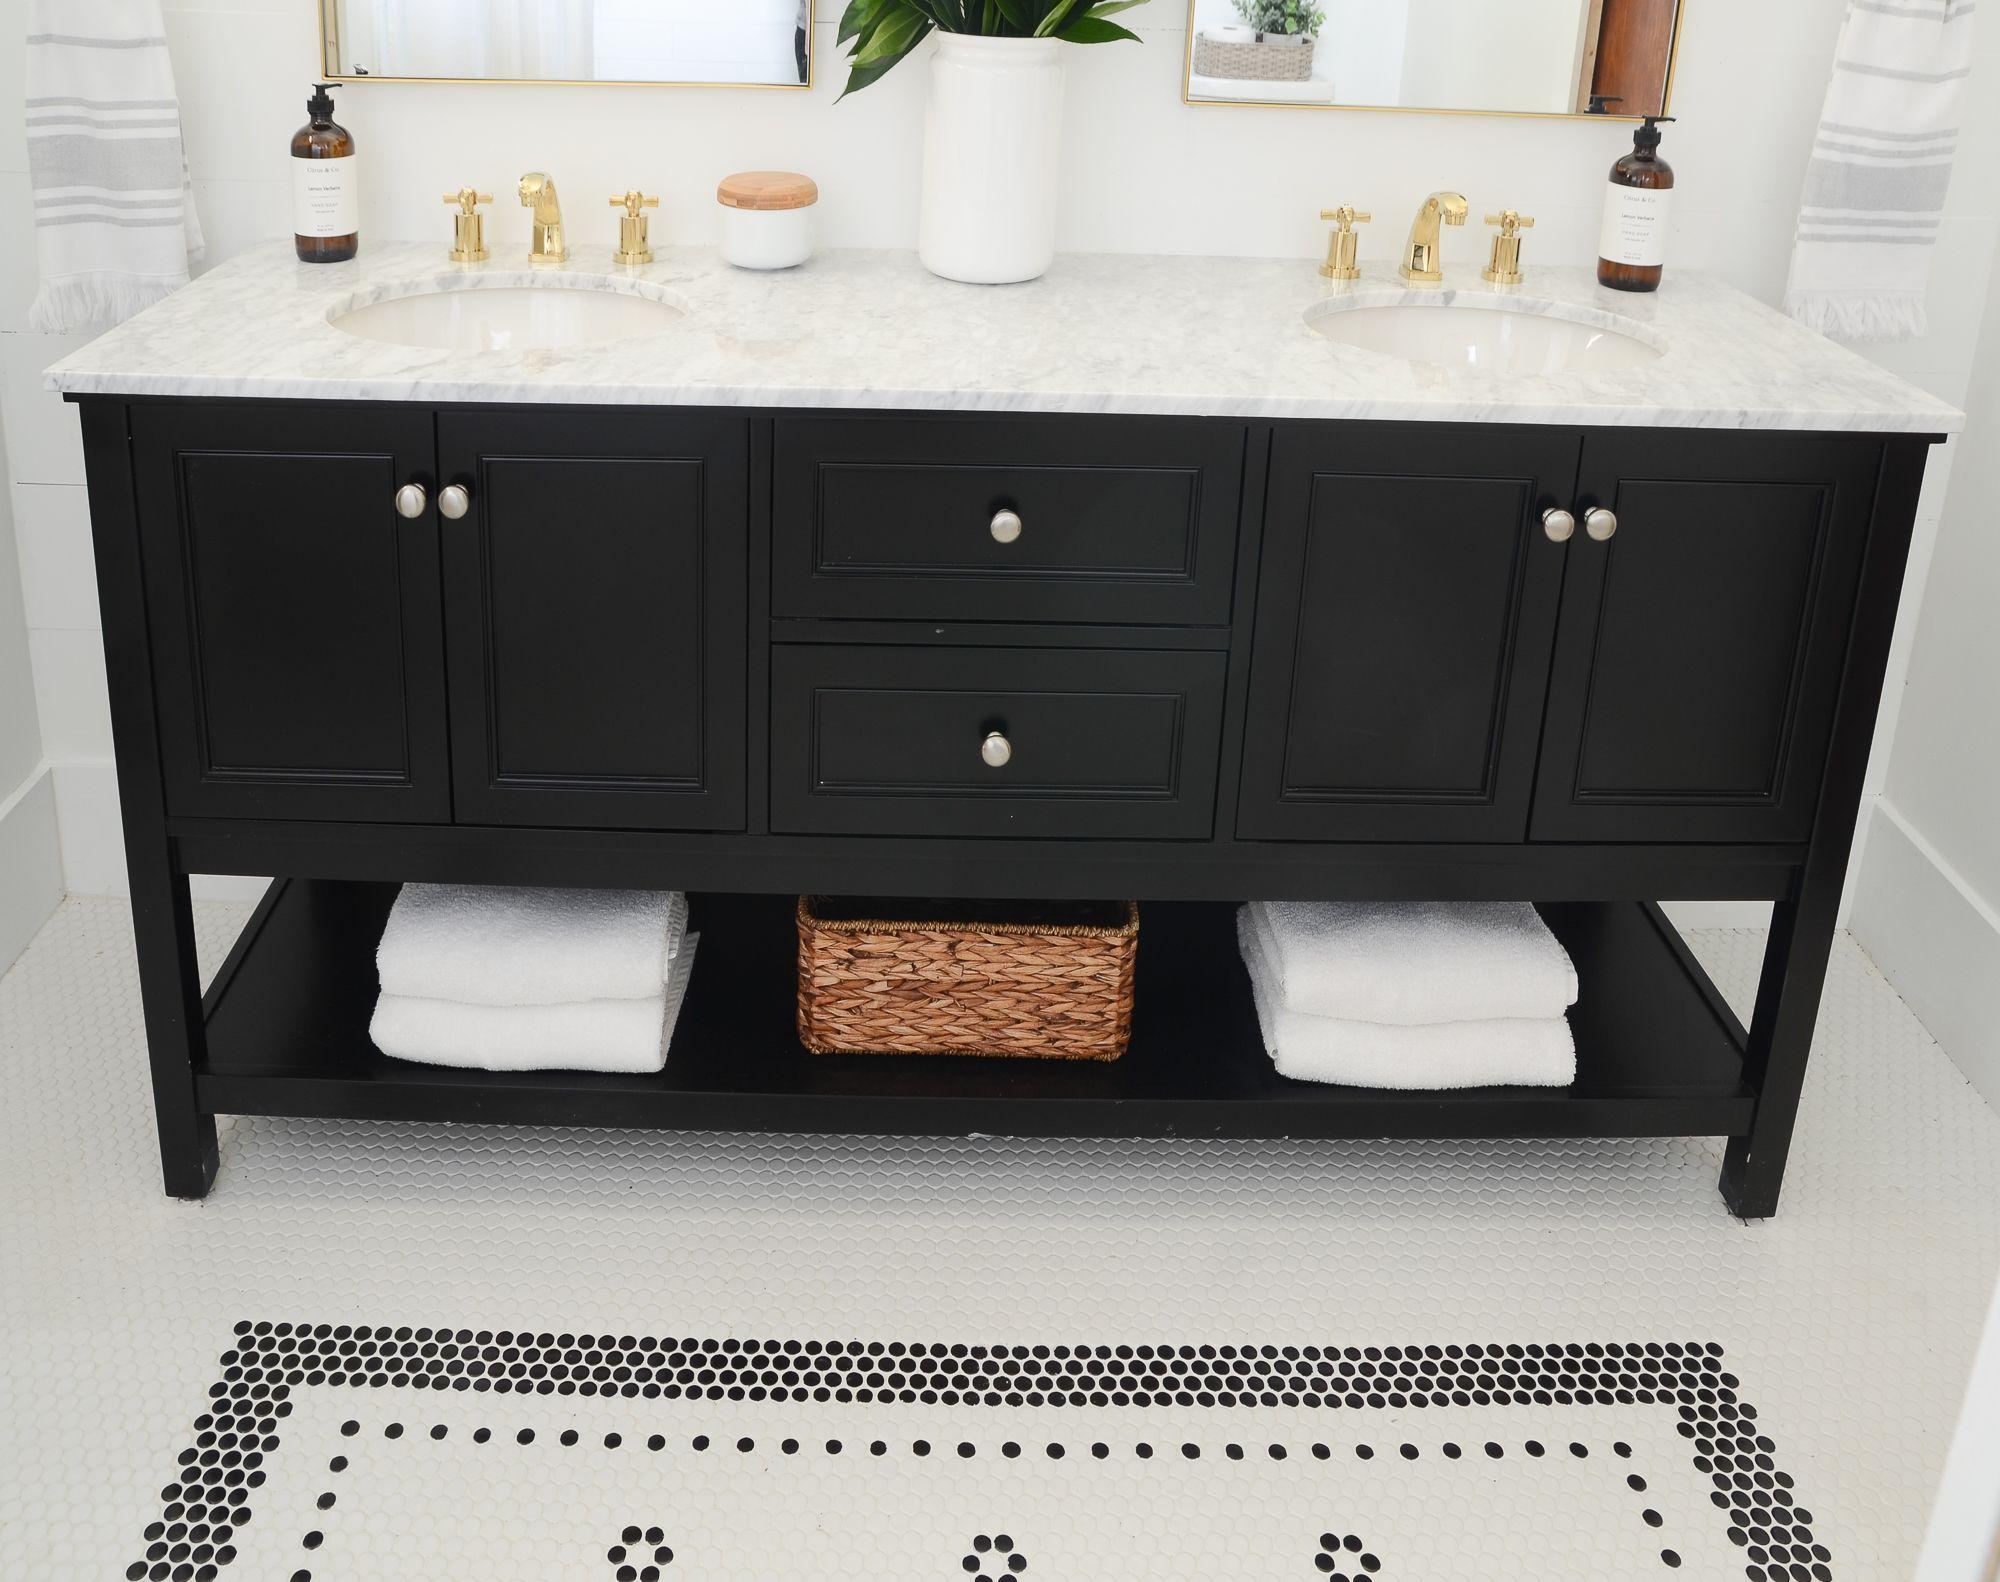 Our Flip House Bathroom Makeover REVEAL! {Wayfair One Room Reno